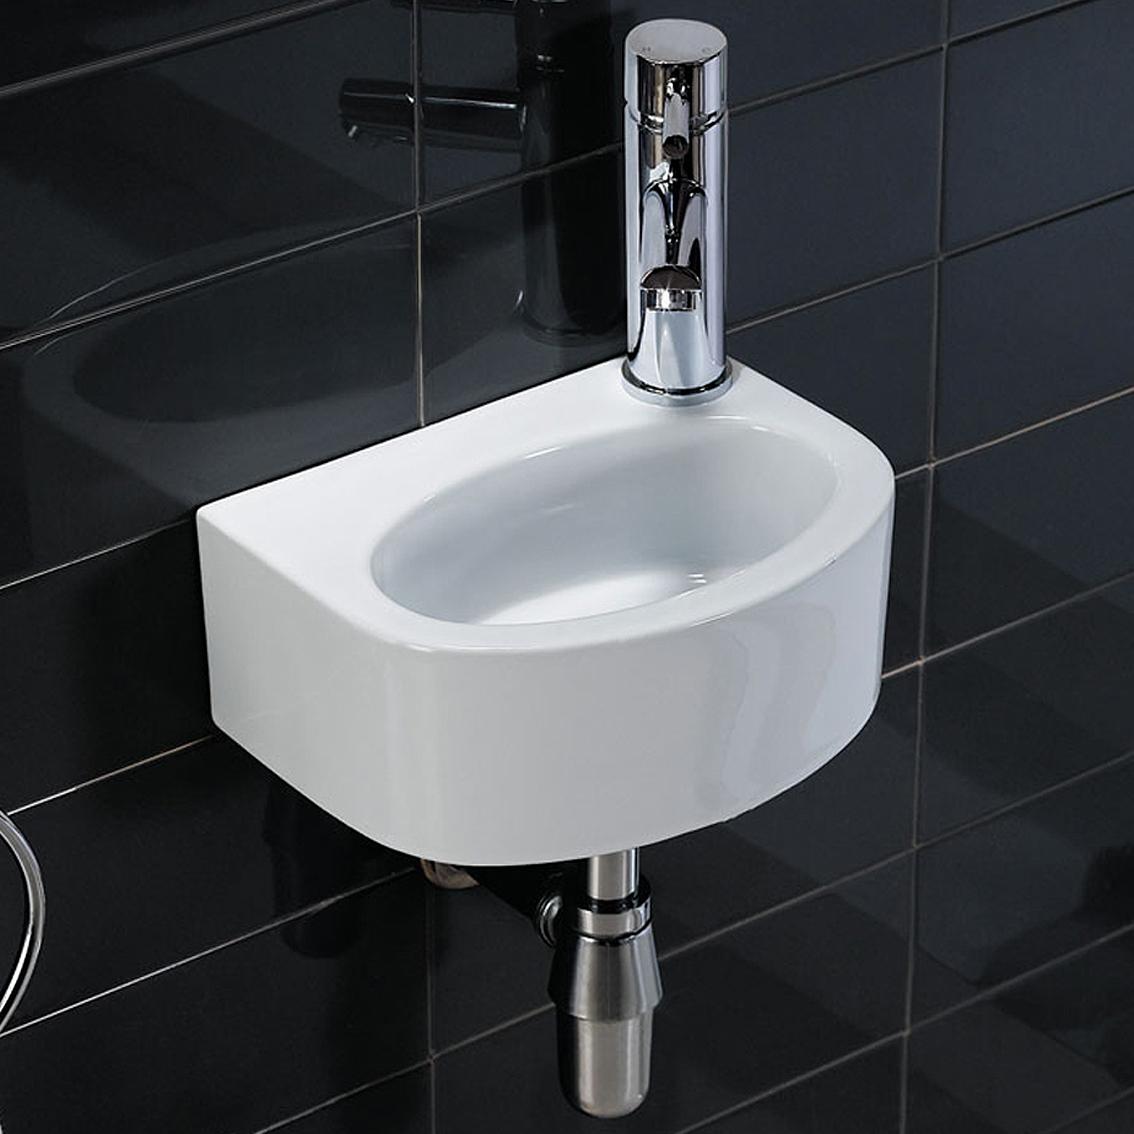 Small Basin Sink : ... -Gloss-Small-Cloakroom-Wall-Mounted-Wash-Basin-Single-Hole-Sink-CA63